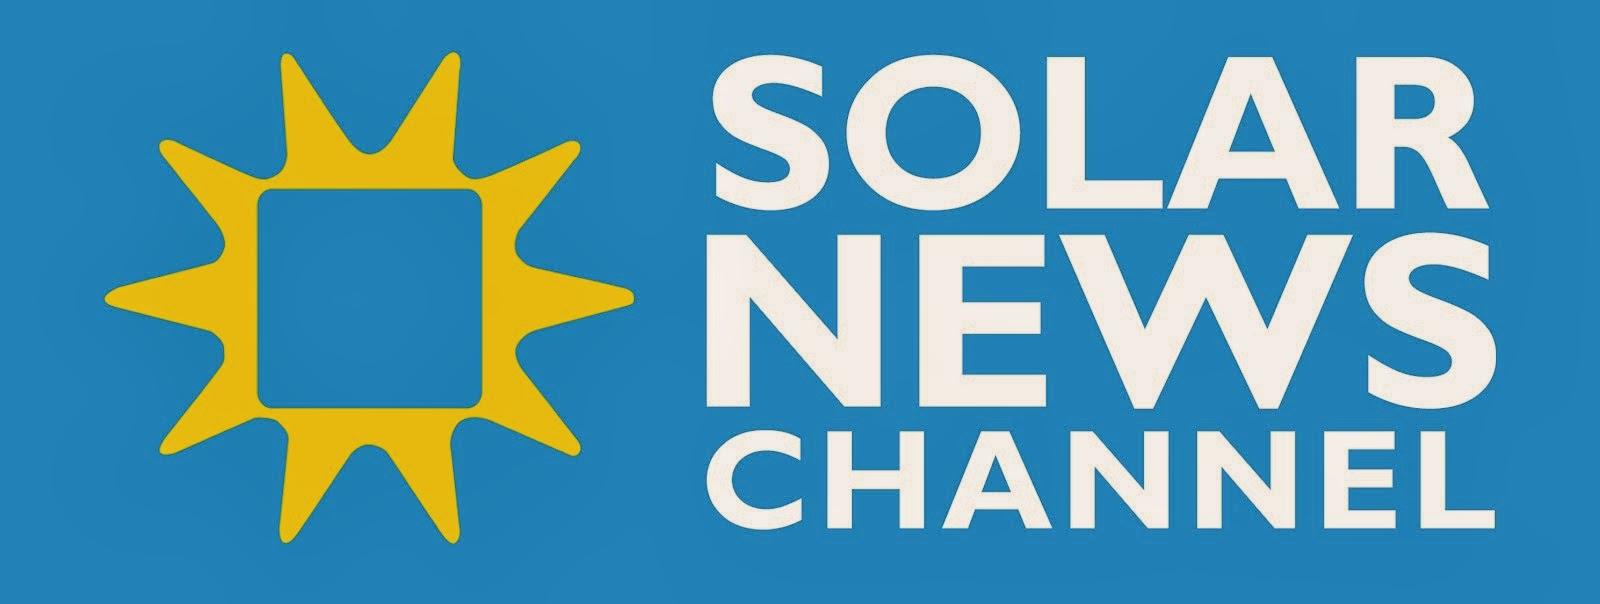 SOLAR NEWS CHANNEL MANAILA